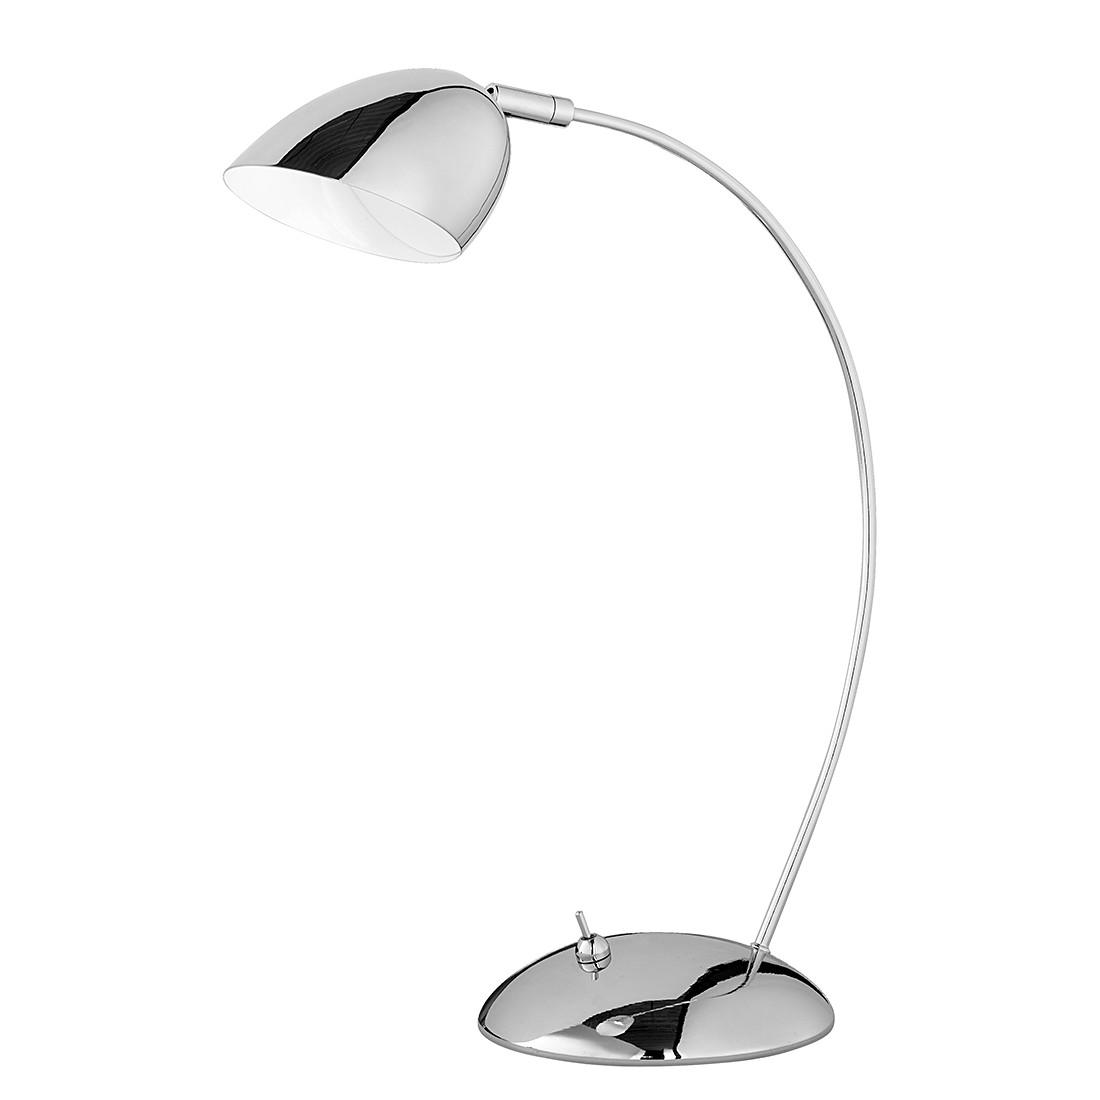 energie  A+, LED-tafellamp - chroomkleurig metaal 1 lichtbron, Trio